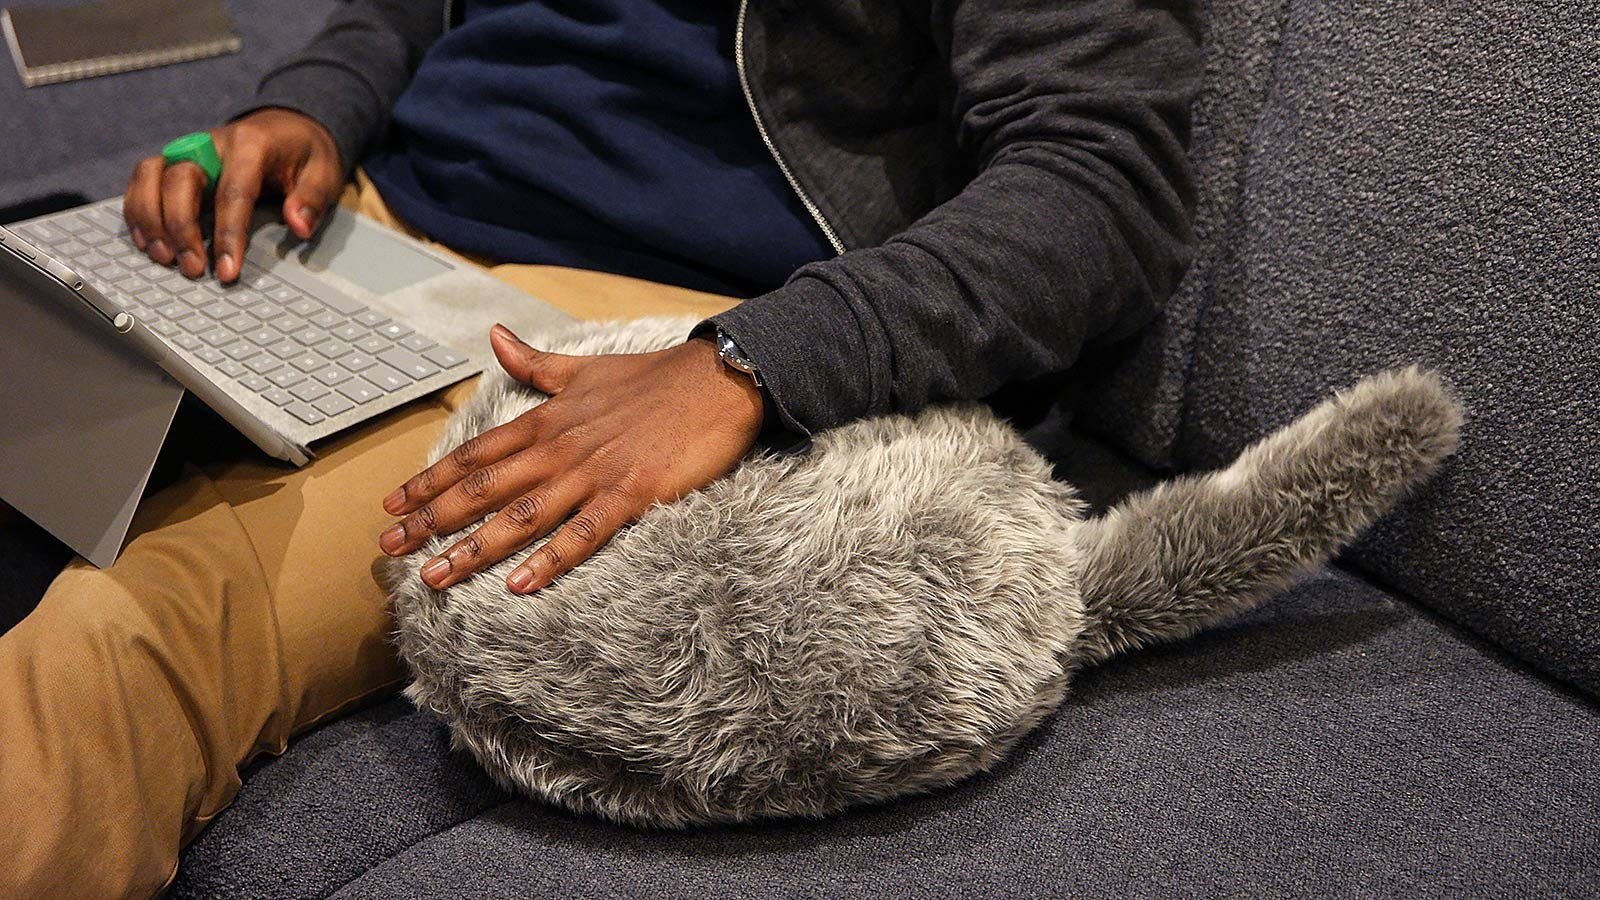 Nice work pillow. Image: Sam Rutherford/Gizmodo